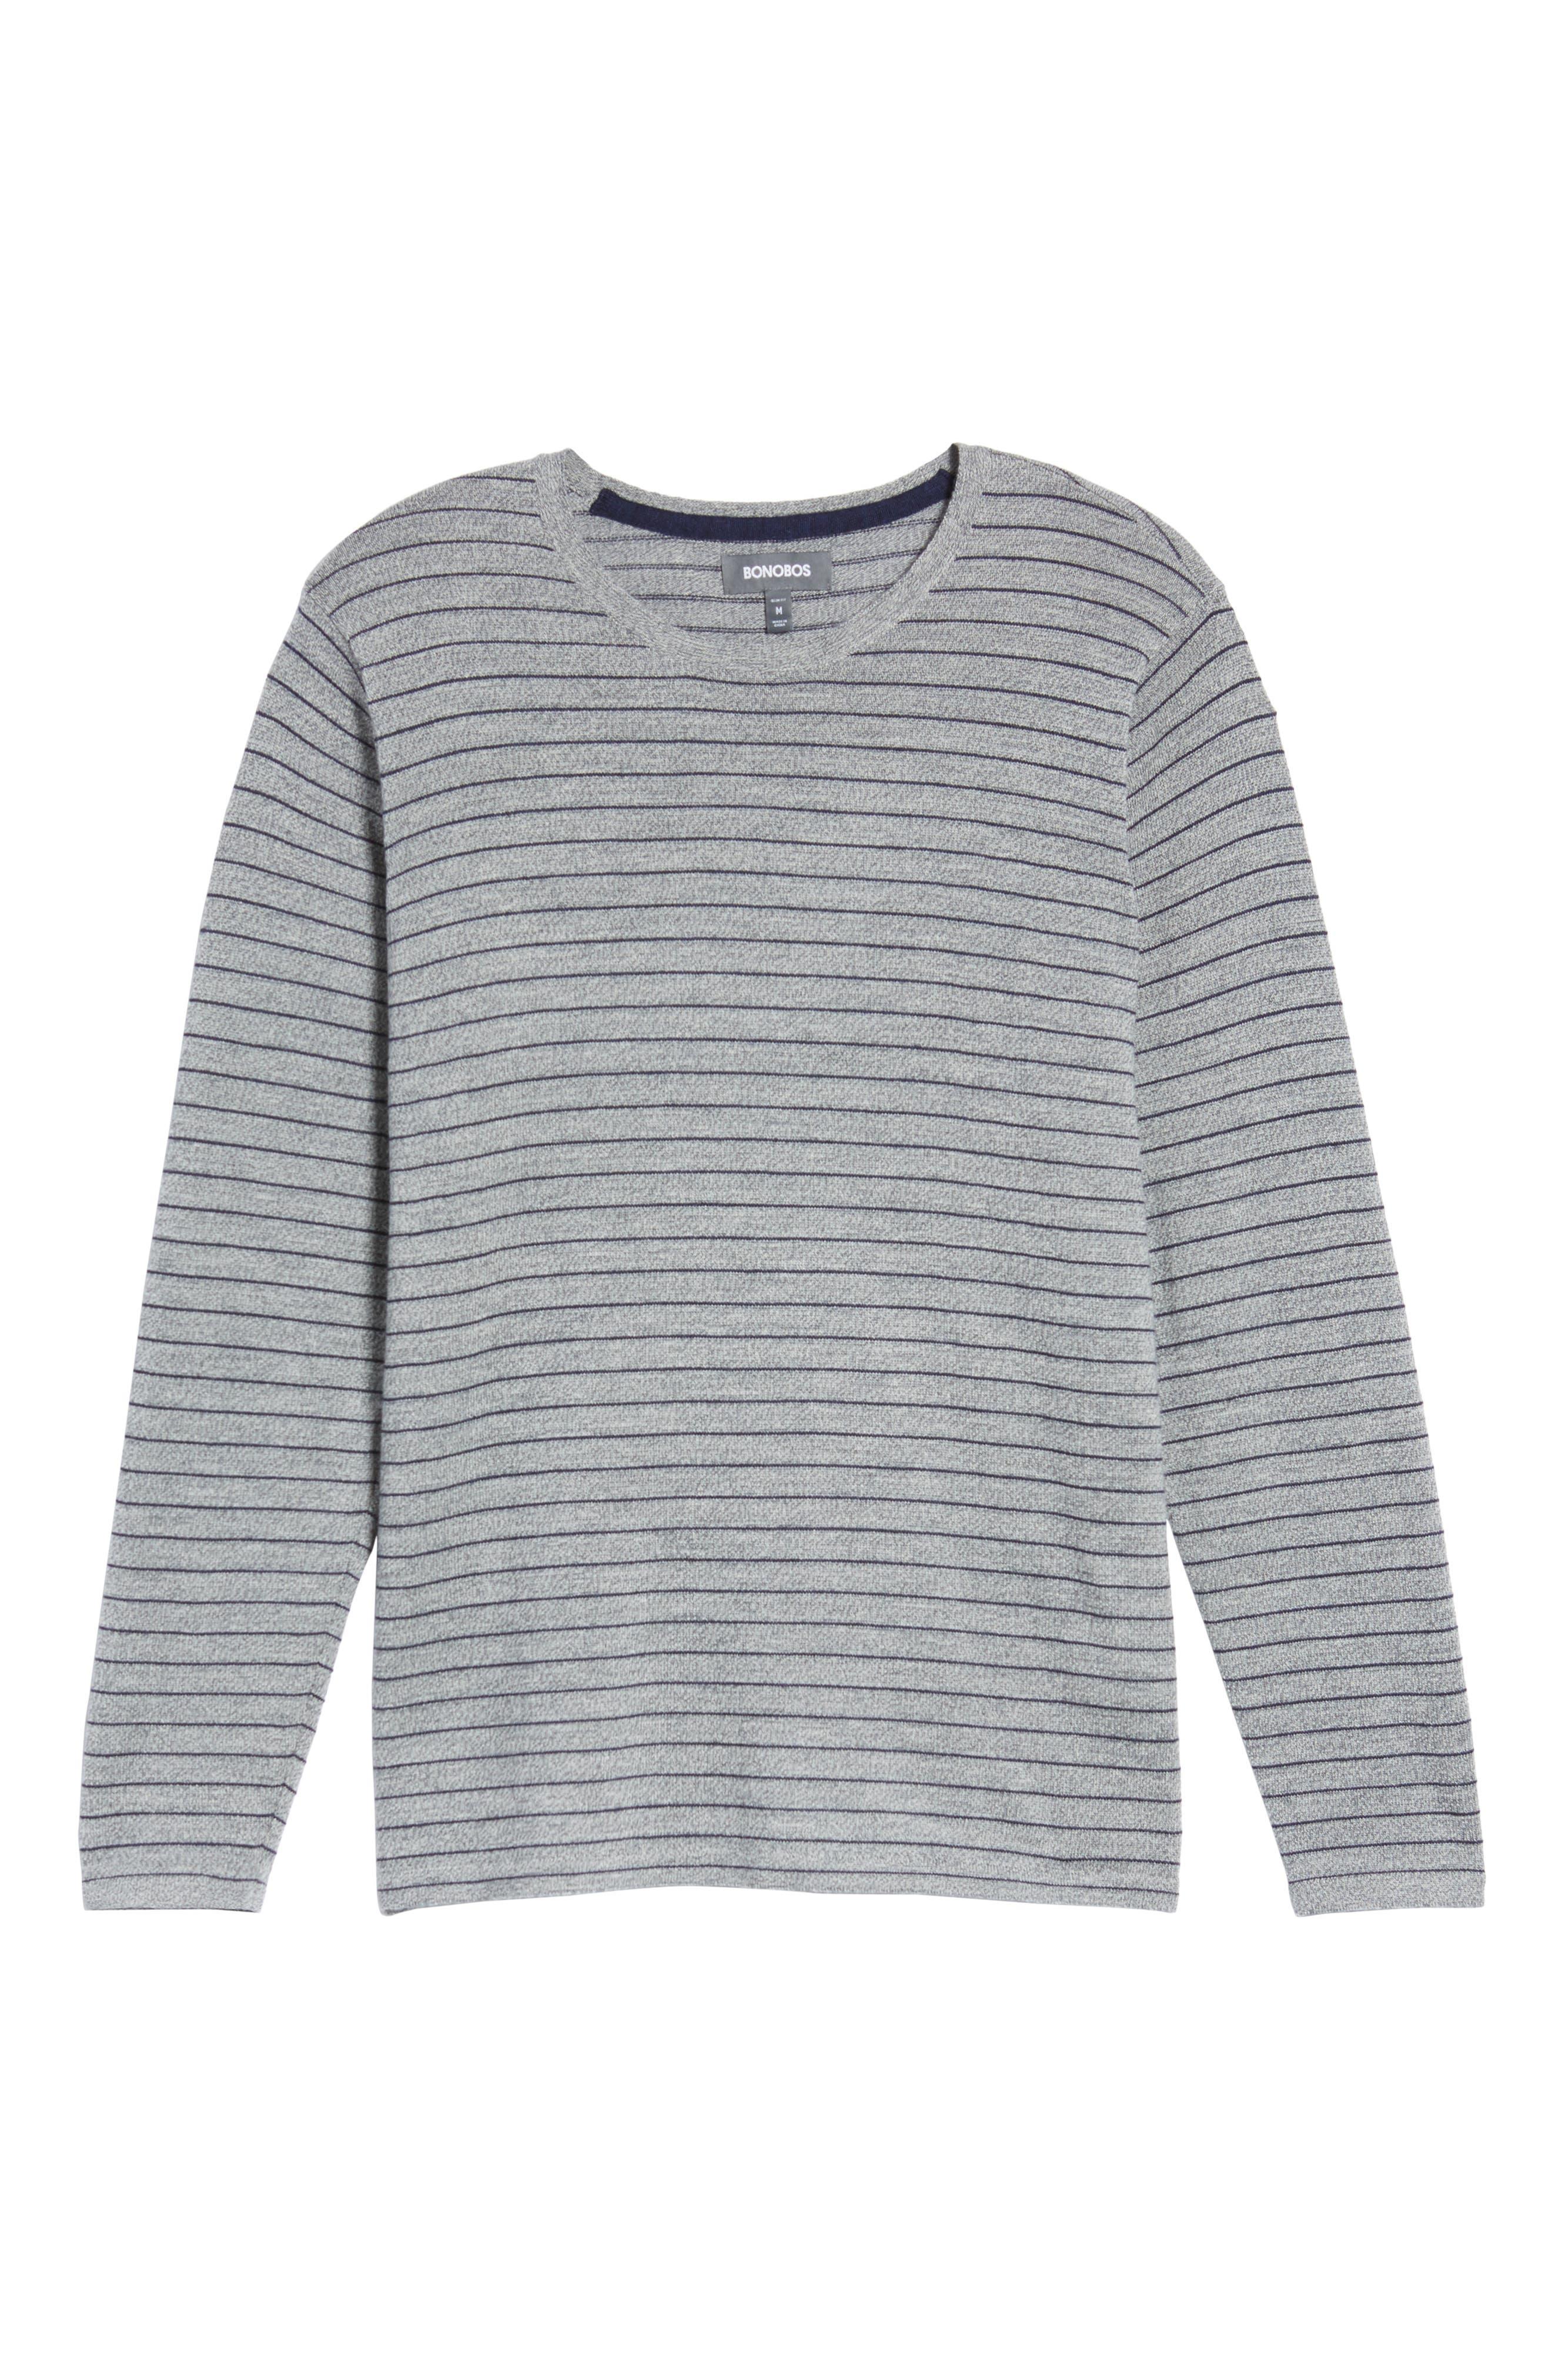 Nori Stripe Merino Wool T-Shirt,                             Alternate thumbnail 6, color,                             Heather Ink